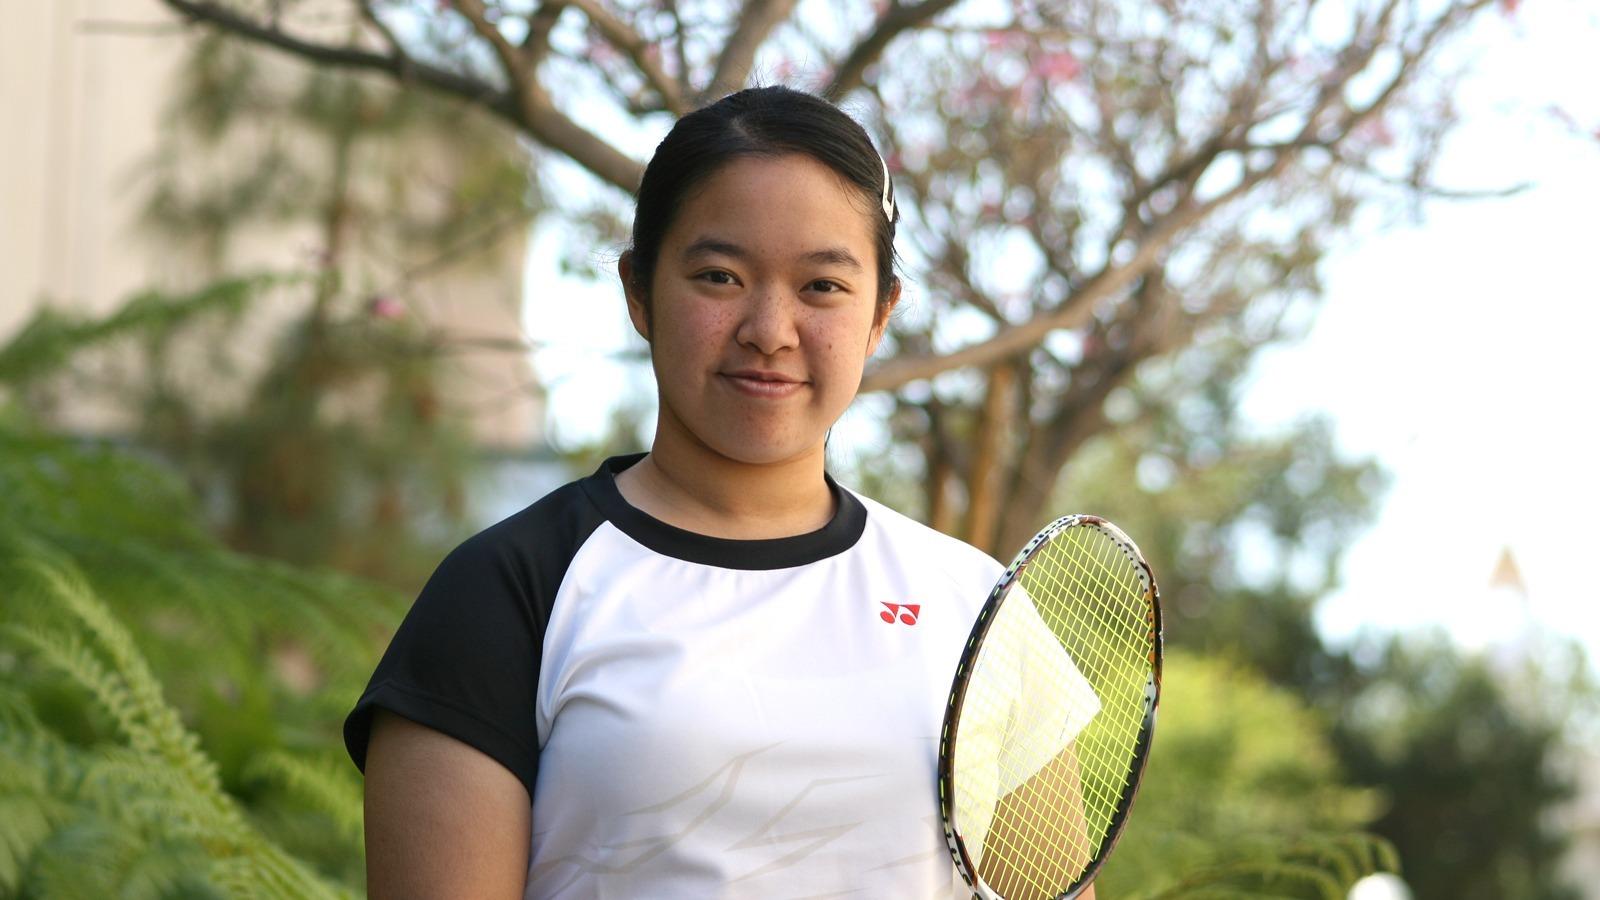 Monique A. LeBleu/Courier Rebecca Tzou, in Badminton doubles practice with partner, Sandra Maw, at the GM building on Thursday, March 24, 2016.